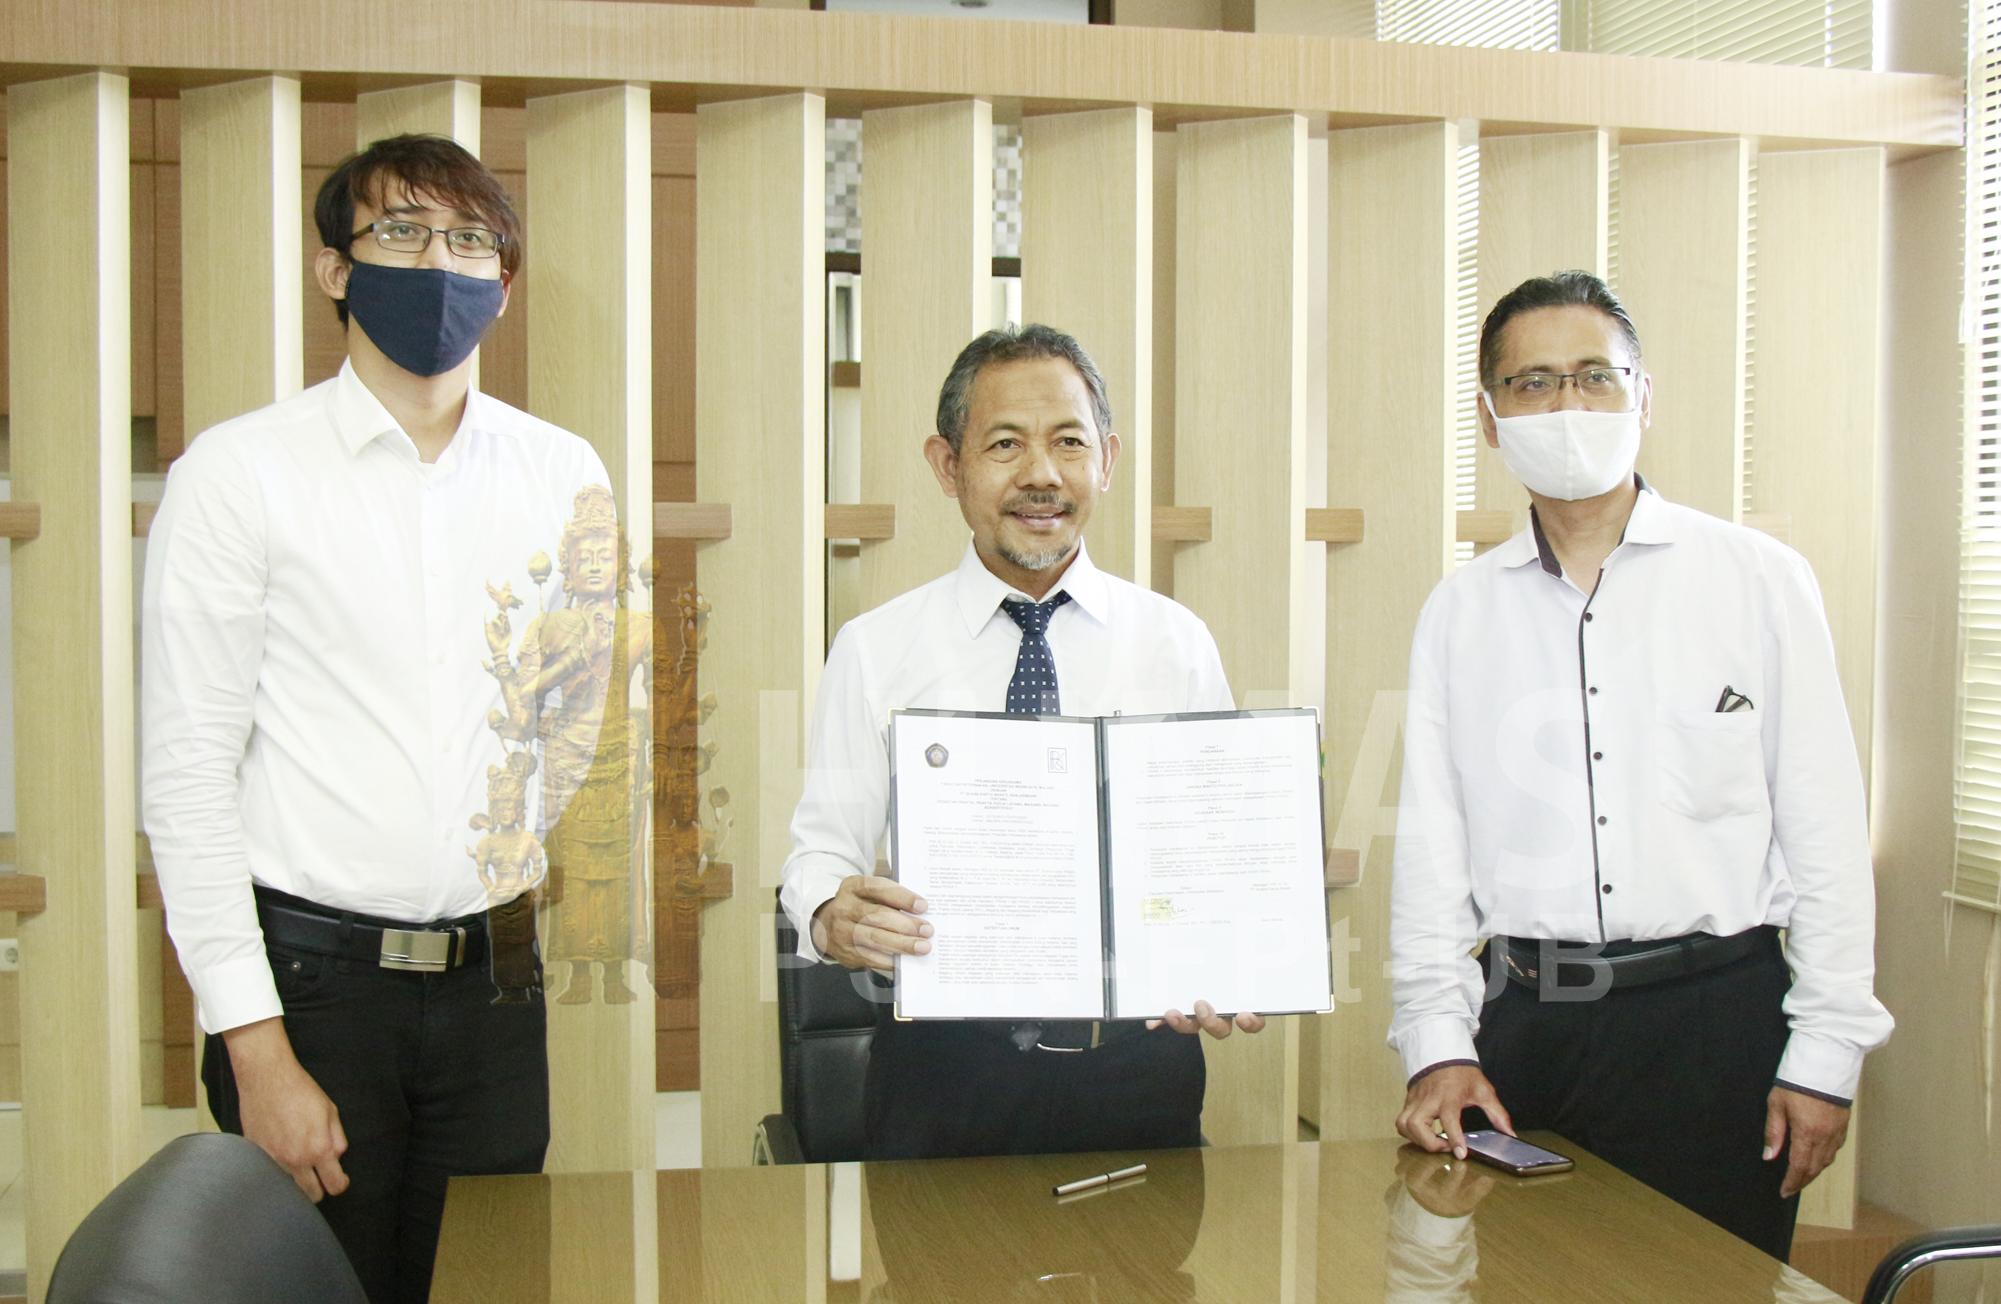 Fapet UB Bersama PT Buana Karya Bhakti Selenggarakan Kegiatan Magang Bersertifikat